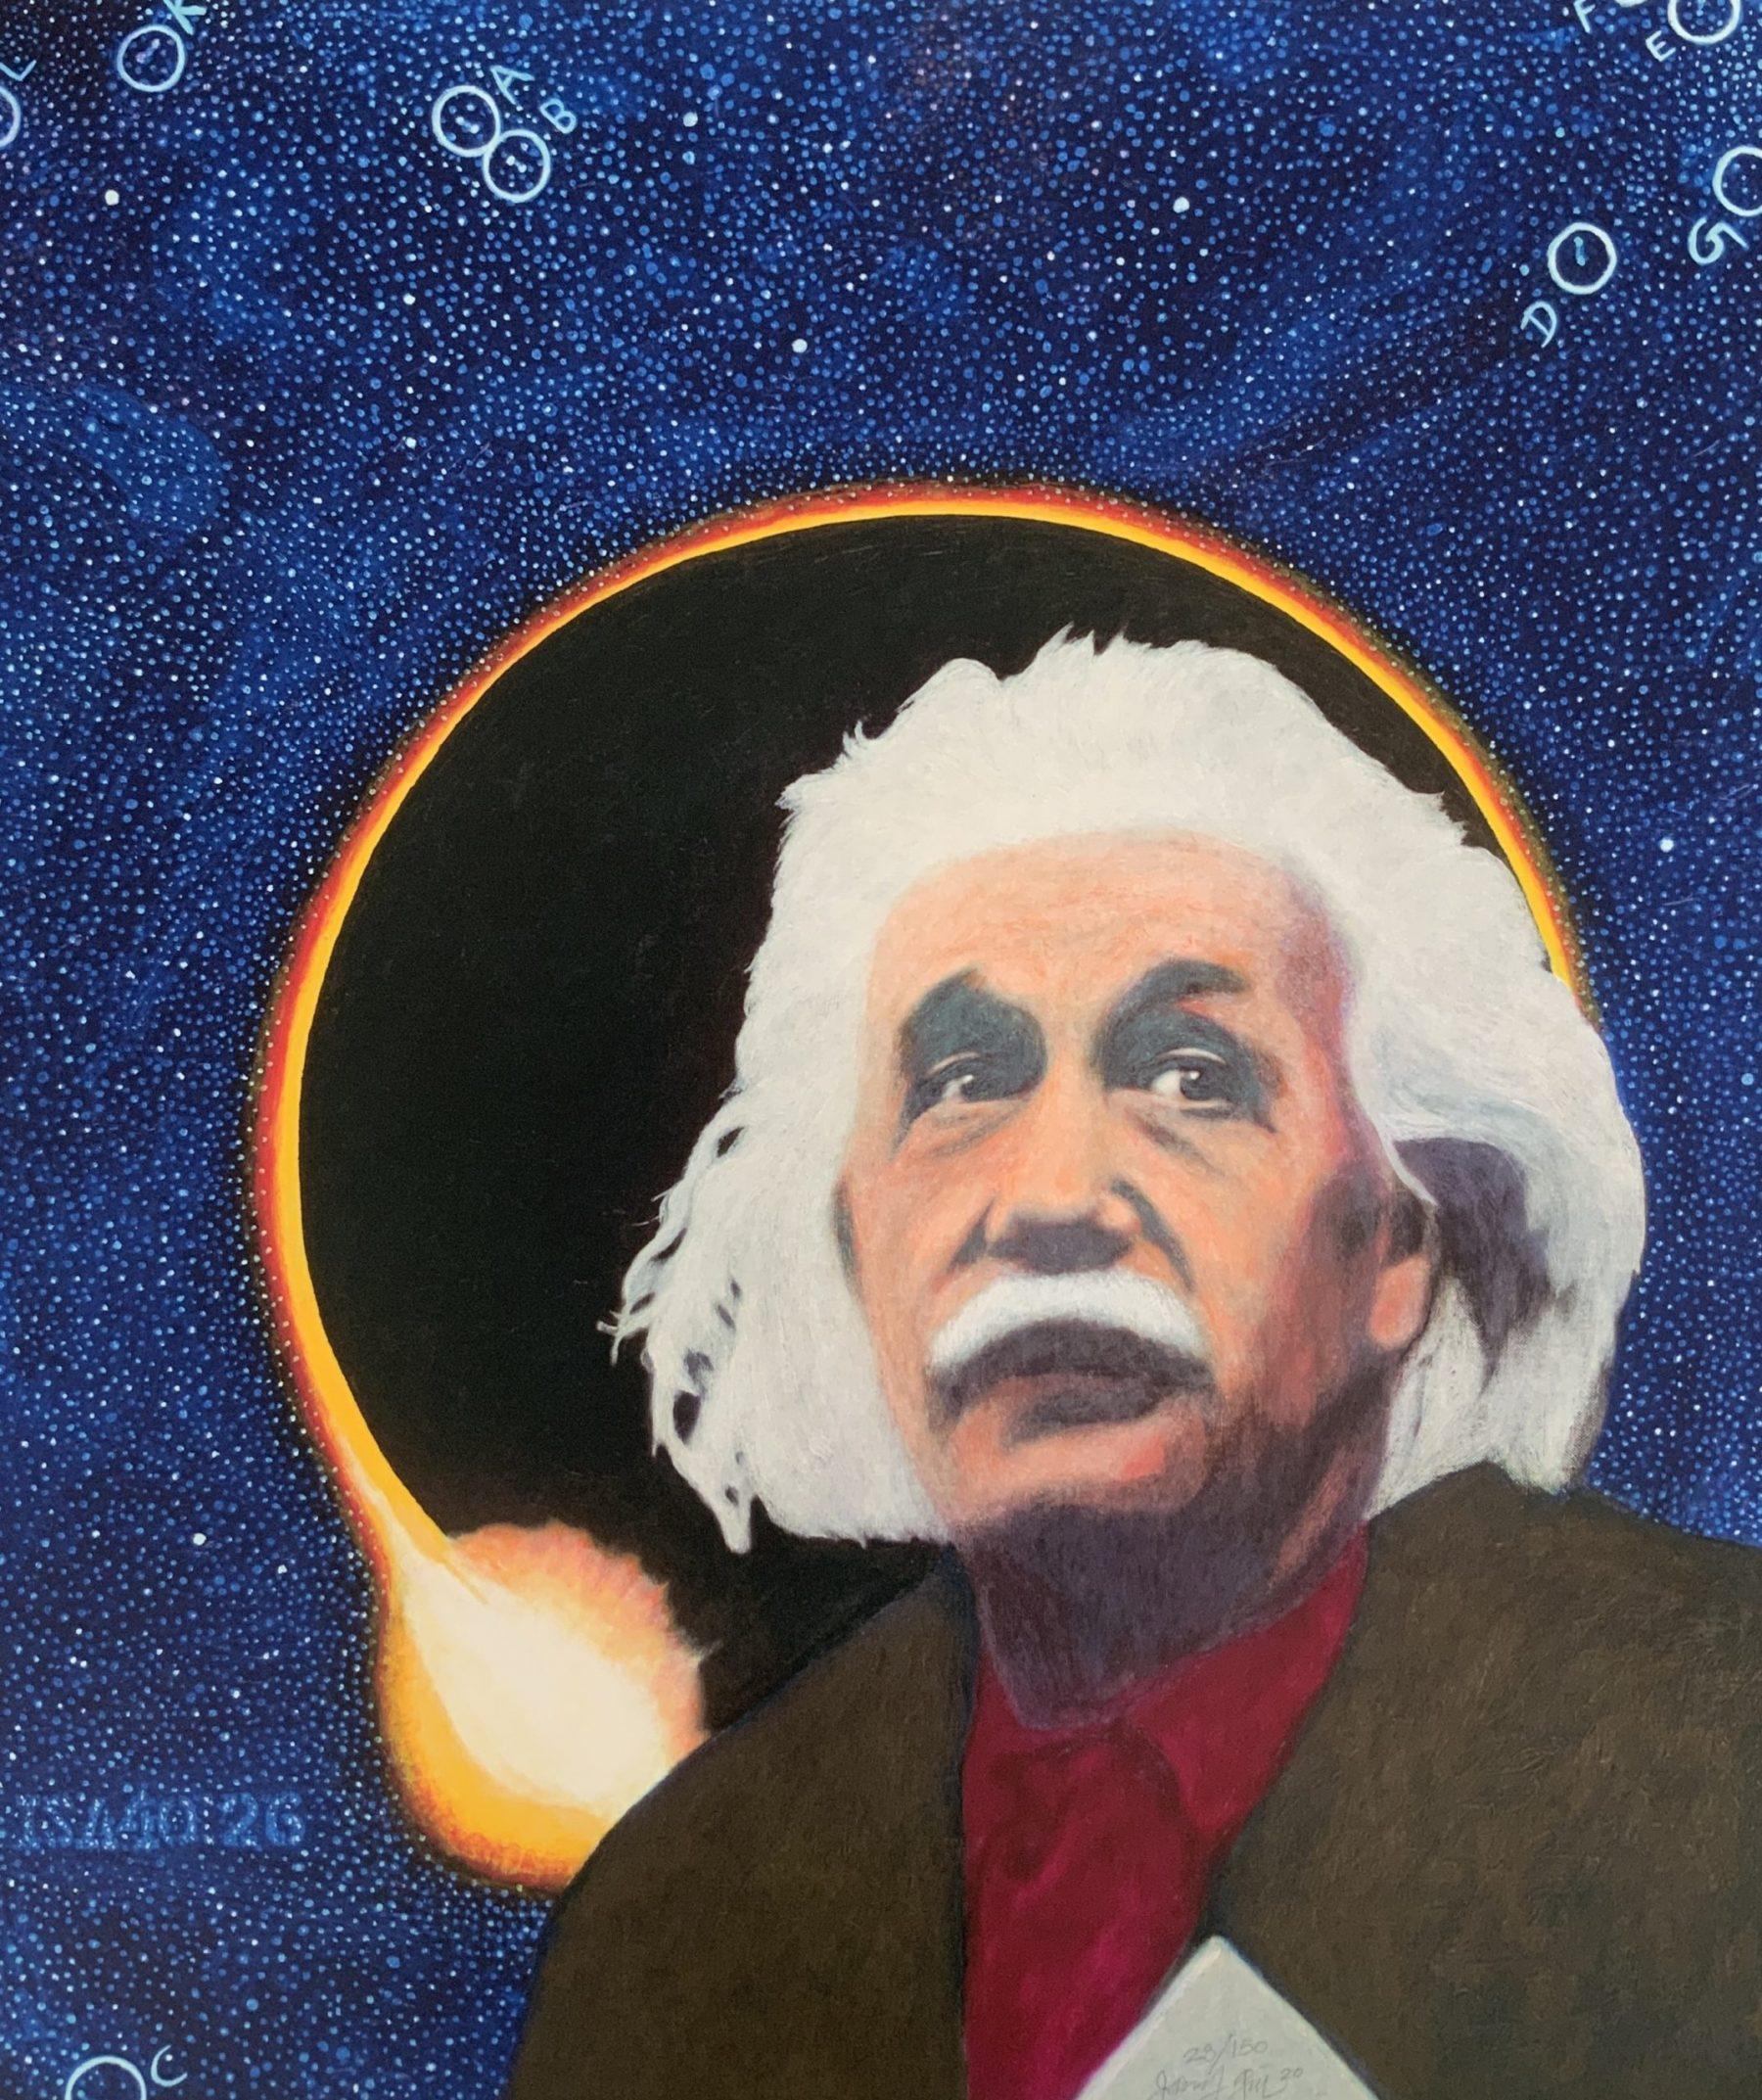 Einstein - Gill, James Francis - k-2010GIL1